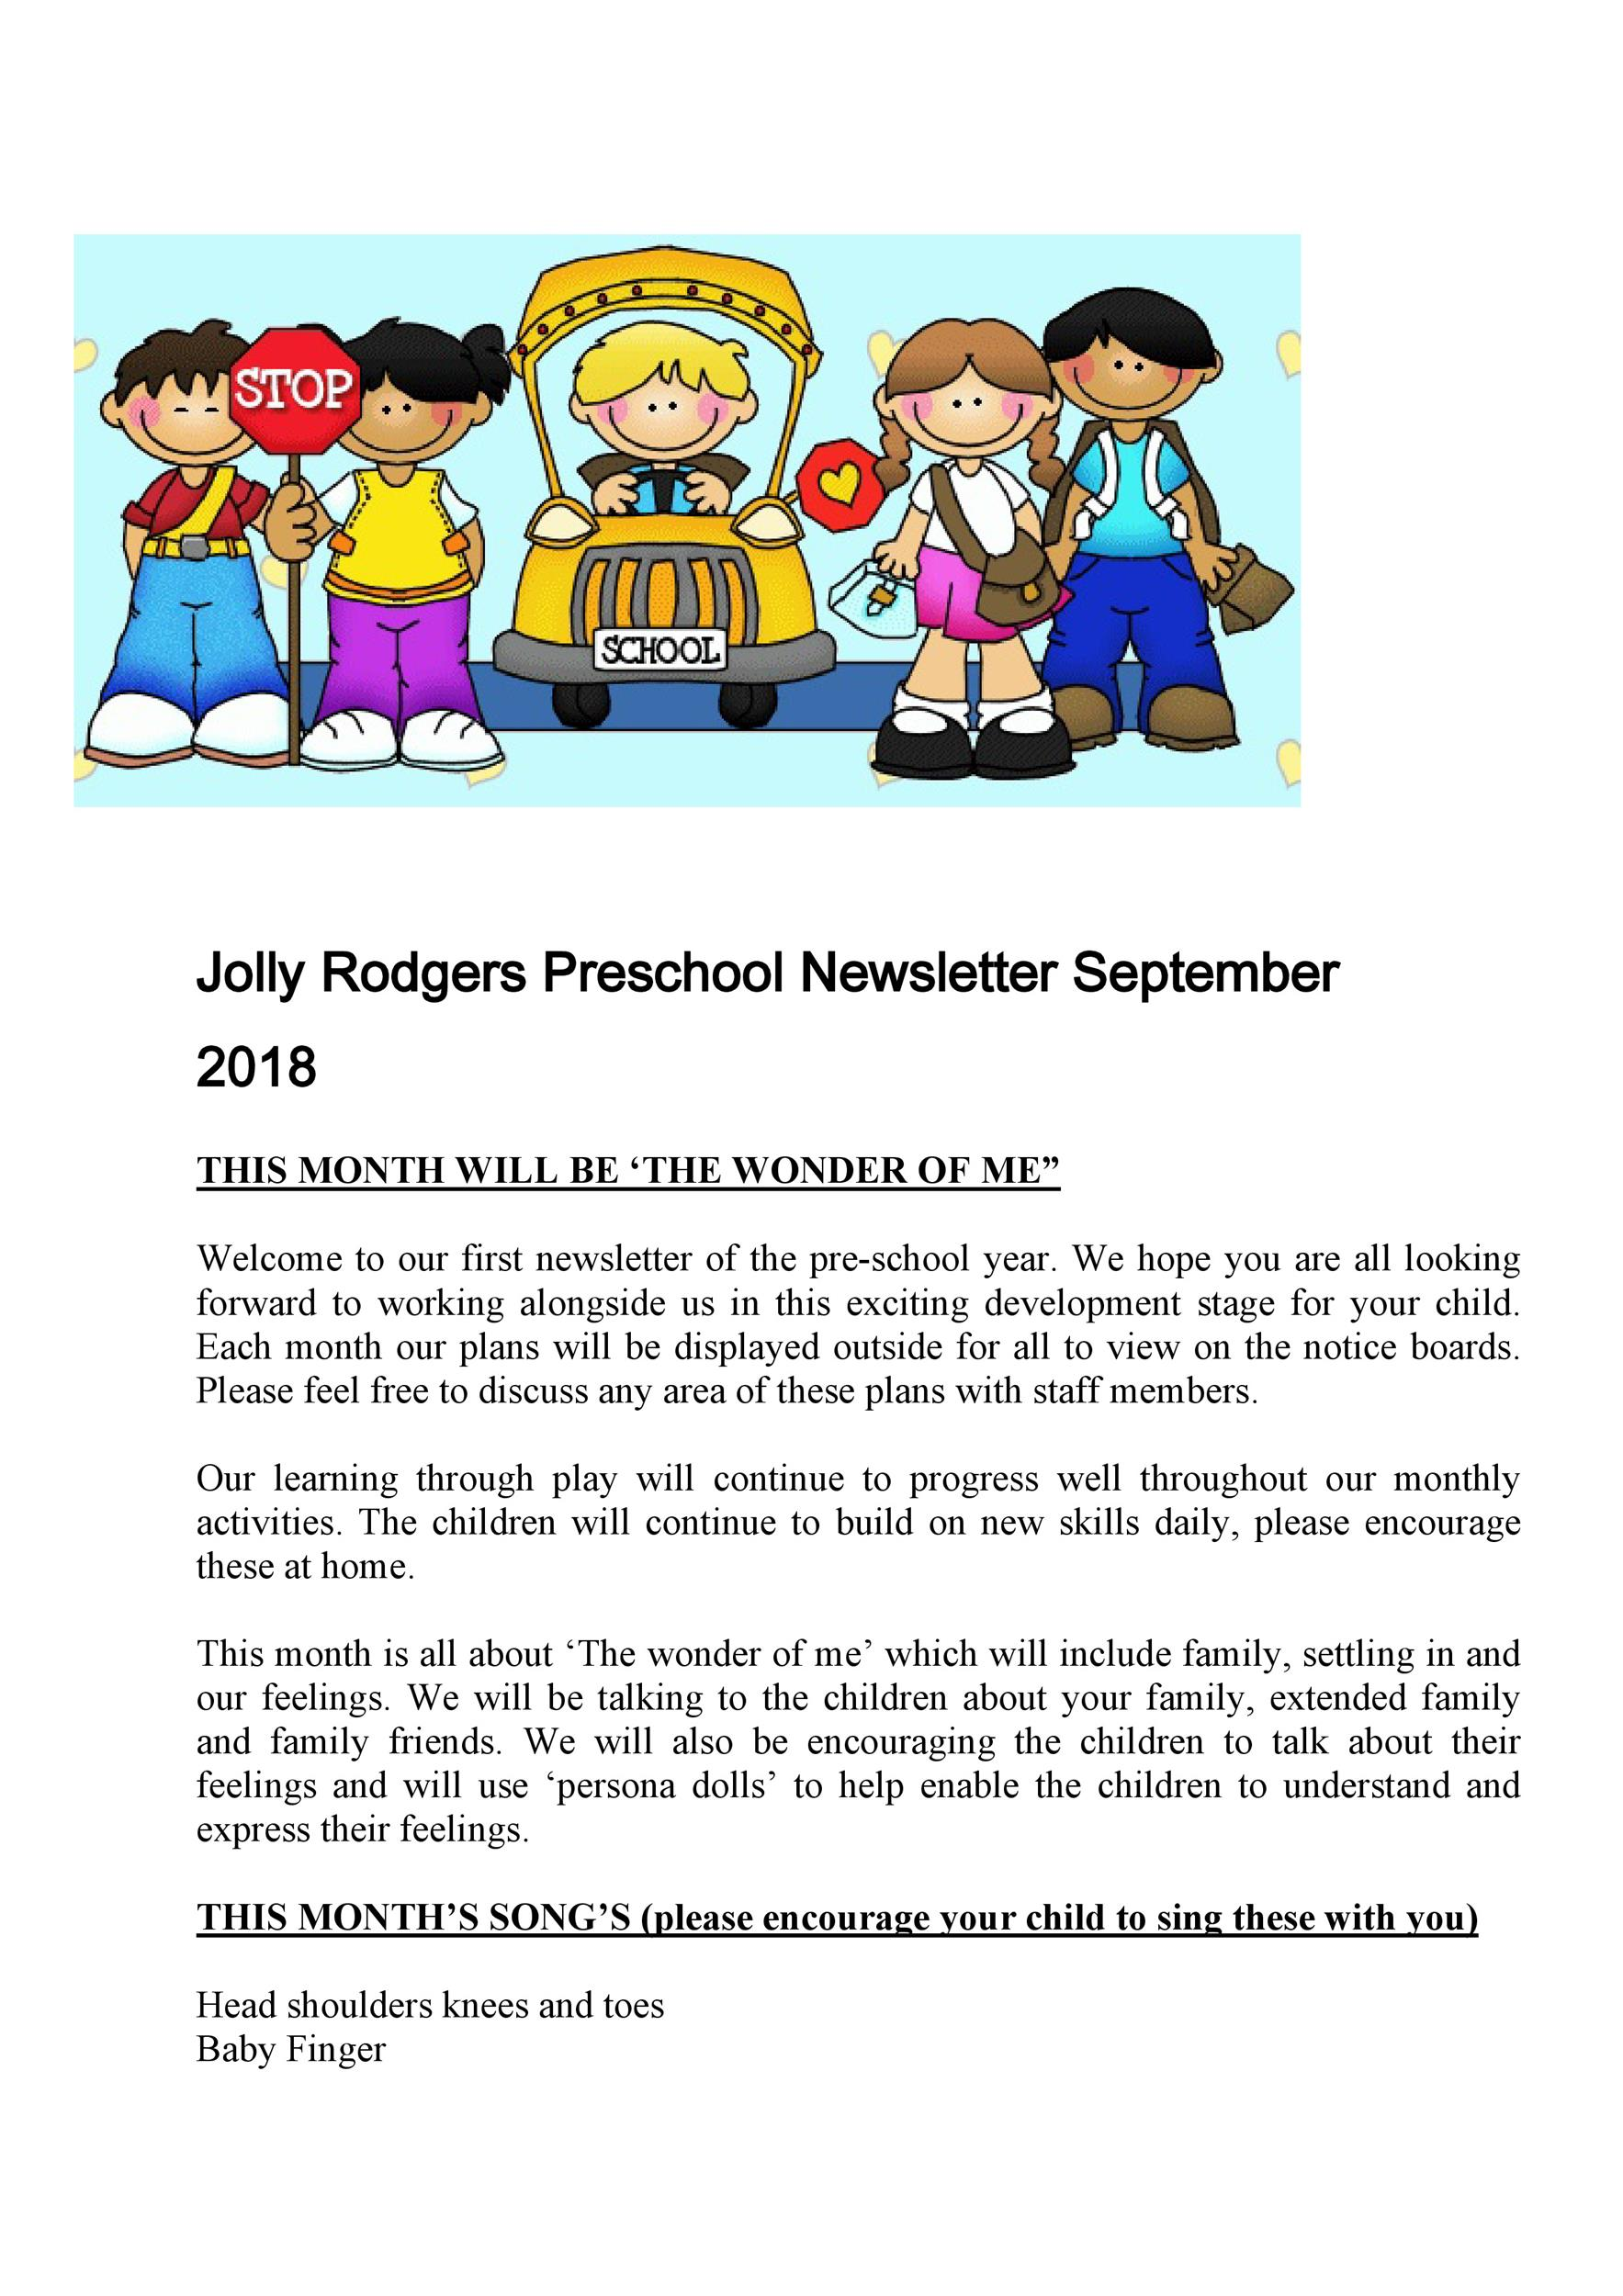 Free preschool newsletter template 04